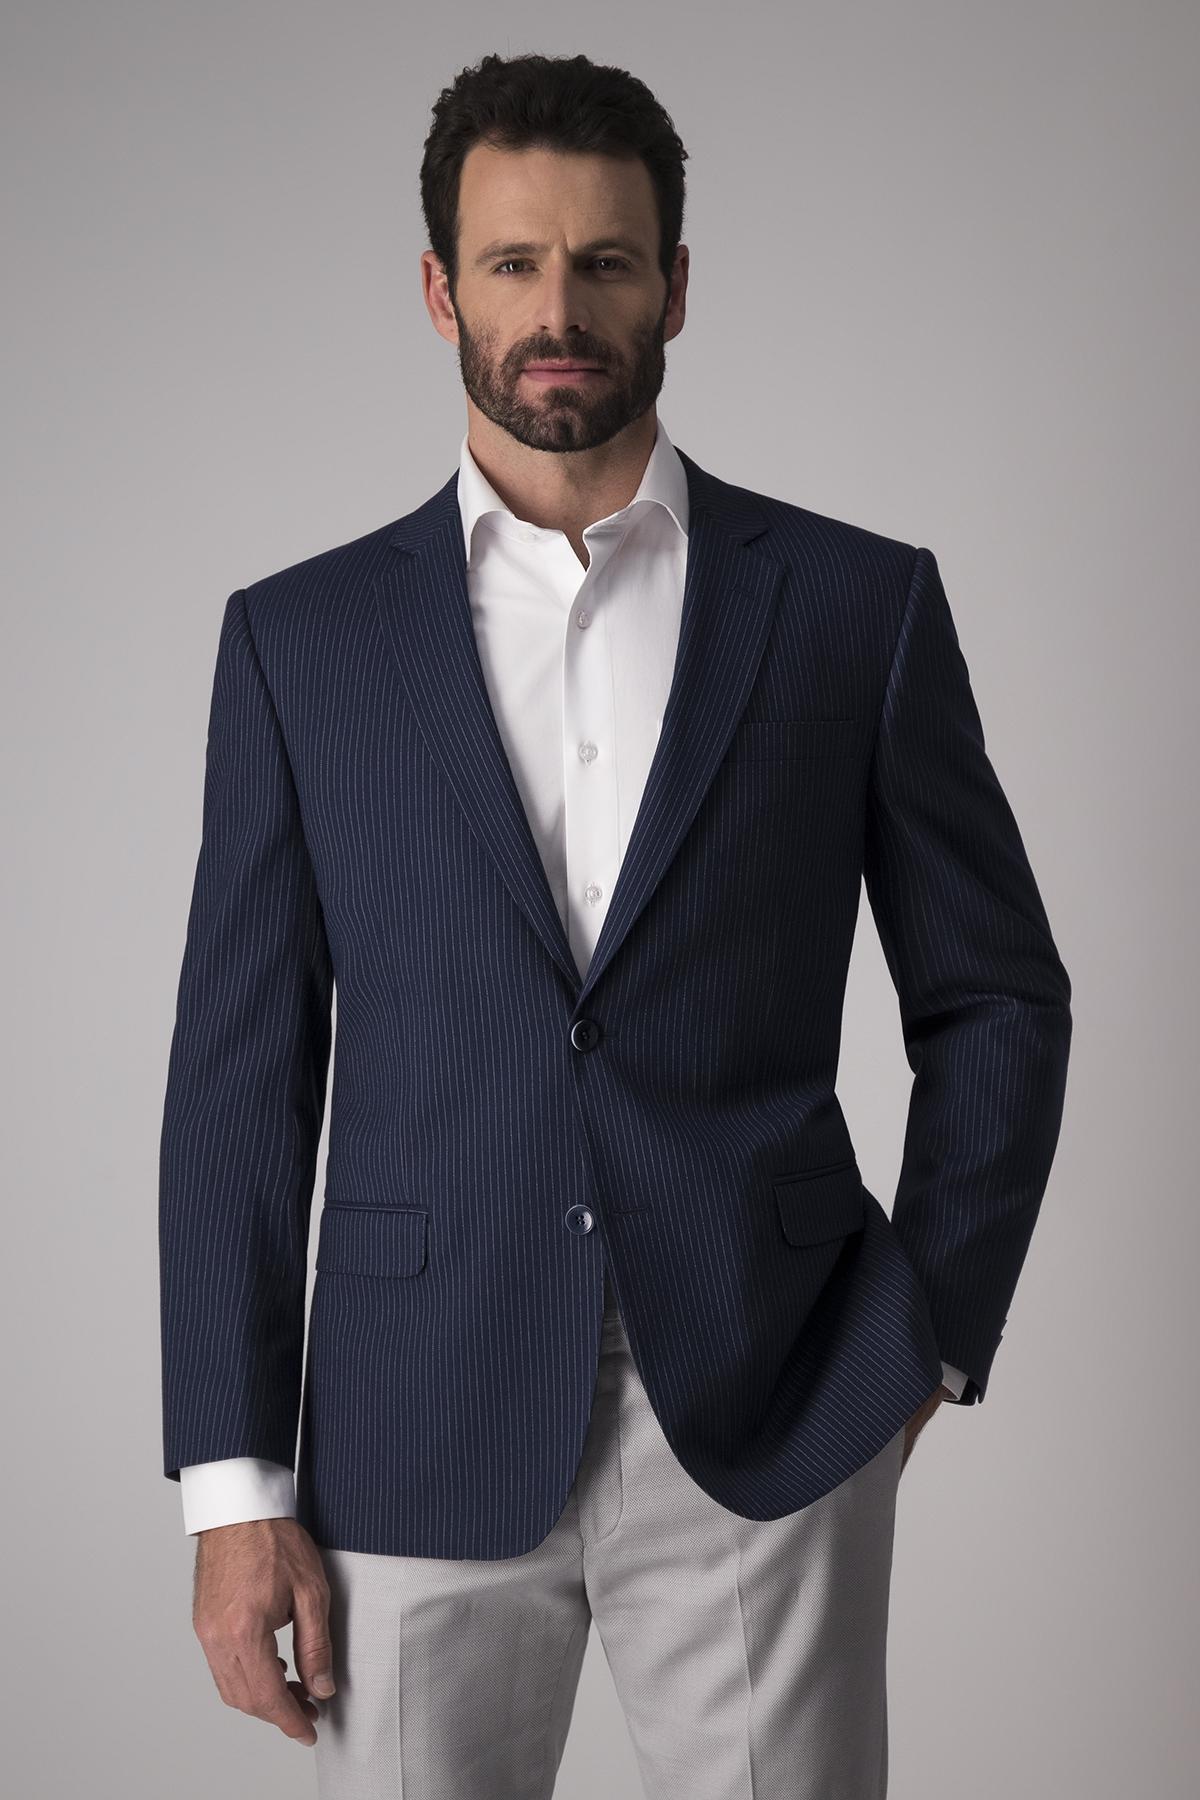 Saco Robert´s  slim fit, algodón mezcla, azul a rayas finas.